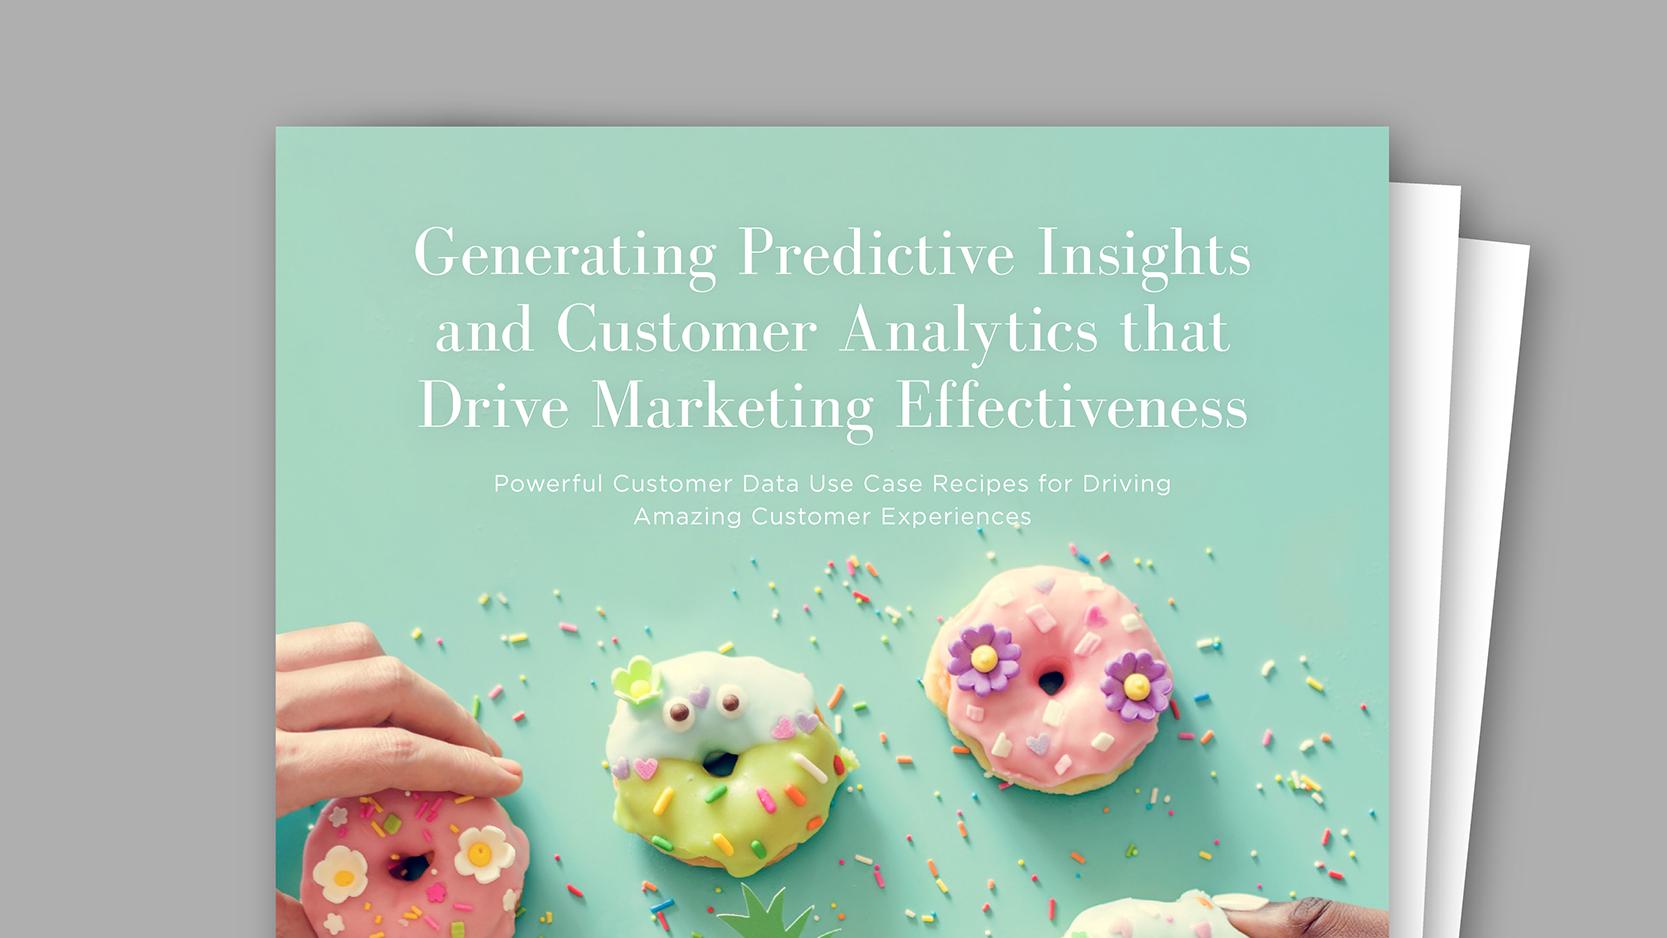 generating-predictive-insights-and-customer-analytics-that-drive-marketing-effectiveness